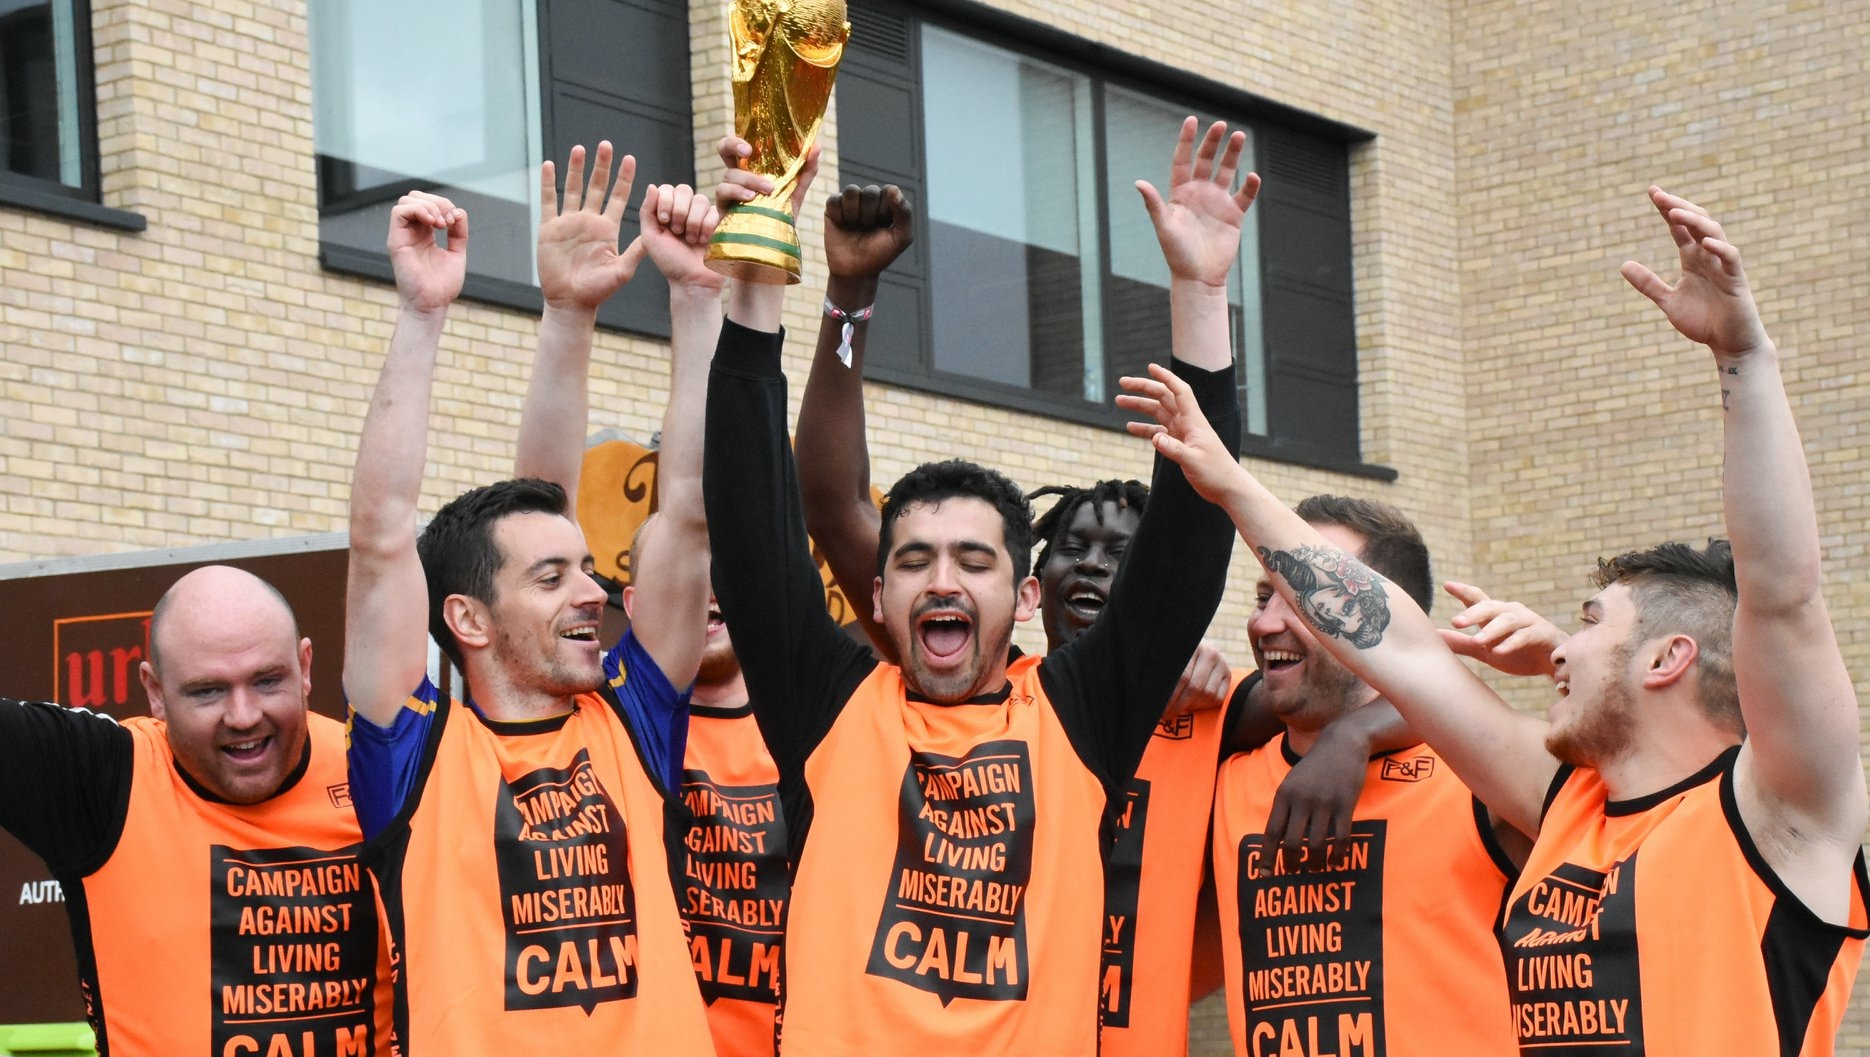 7 men lifting a trophy in celebration